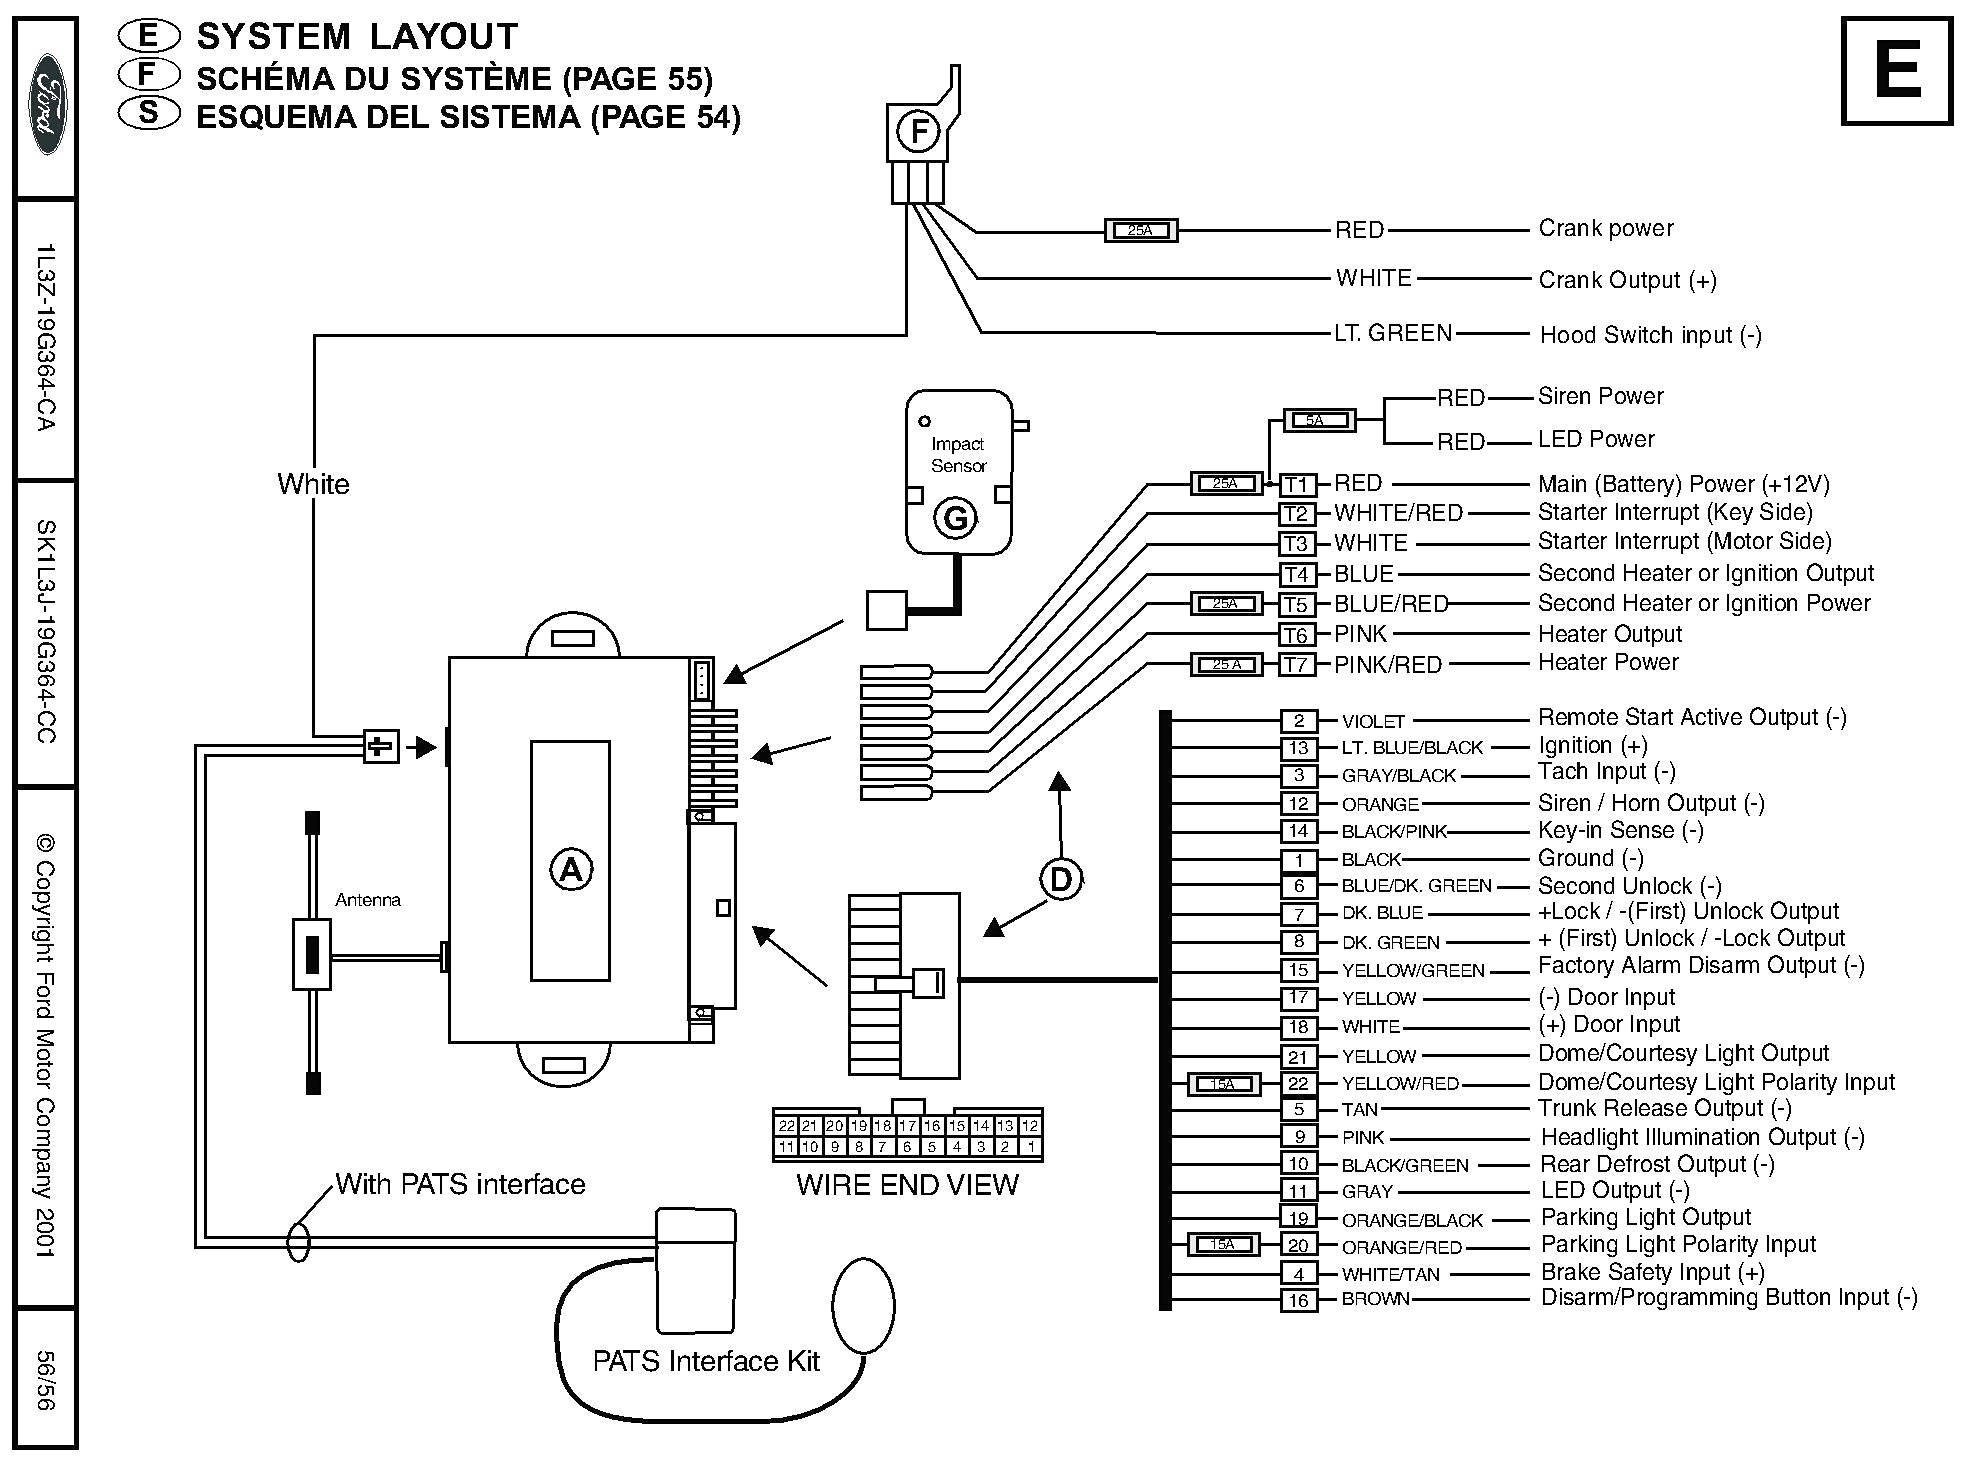 Alarm Wiring Diagrams for Cars Bulldog Car Alarm Wiring Diagram Domestic Fresh Manual In Of Alarm Wiring Diagrams for Cars